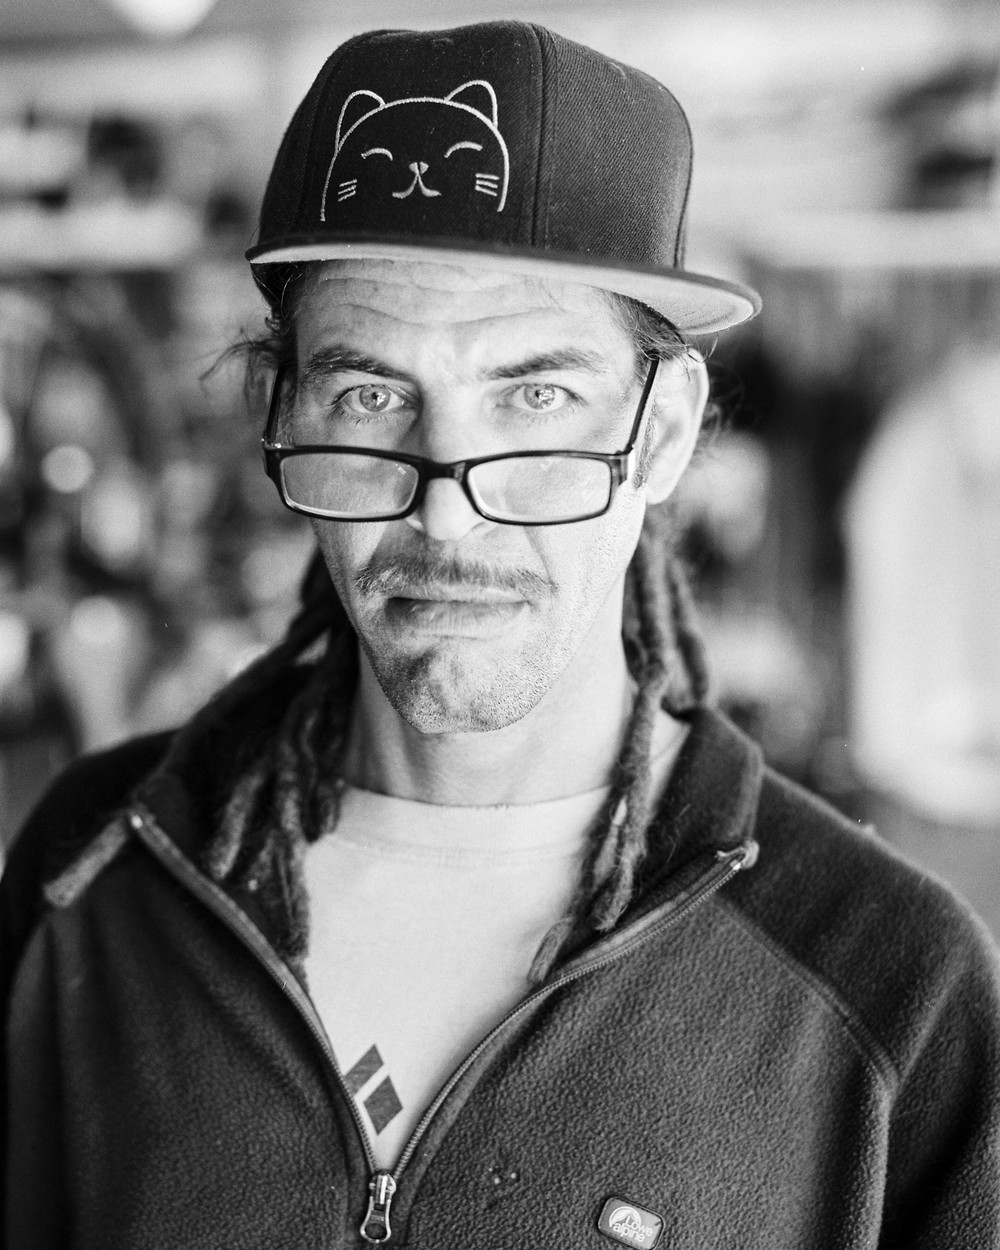 Chris Hill, co-owner of Moab Classic Bike.